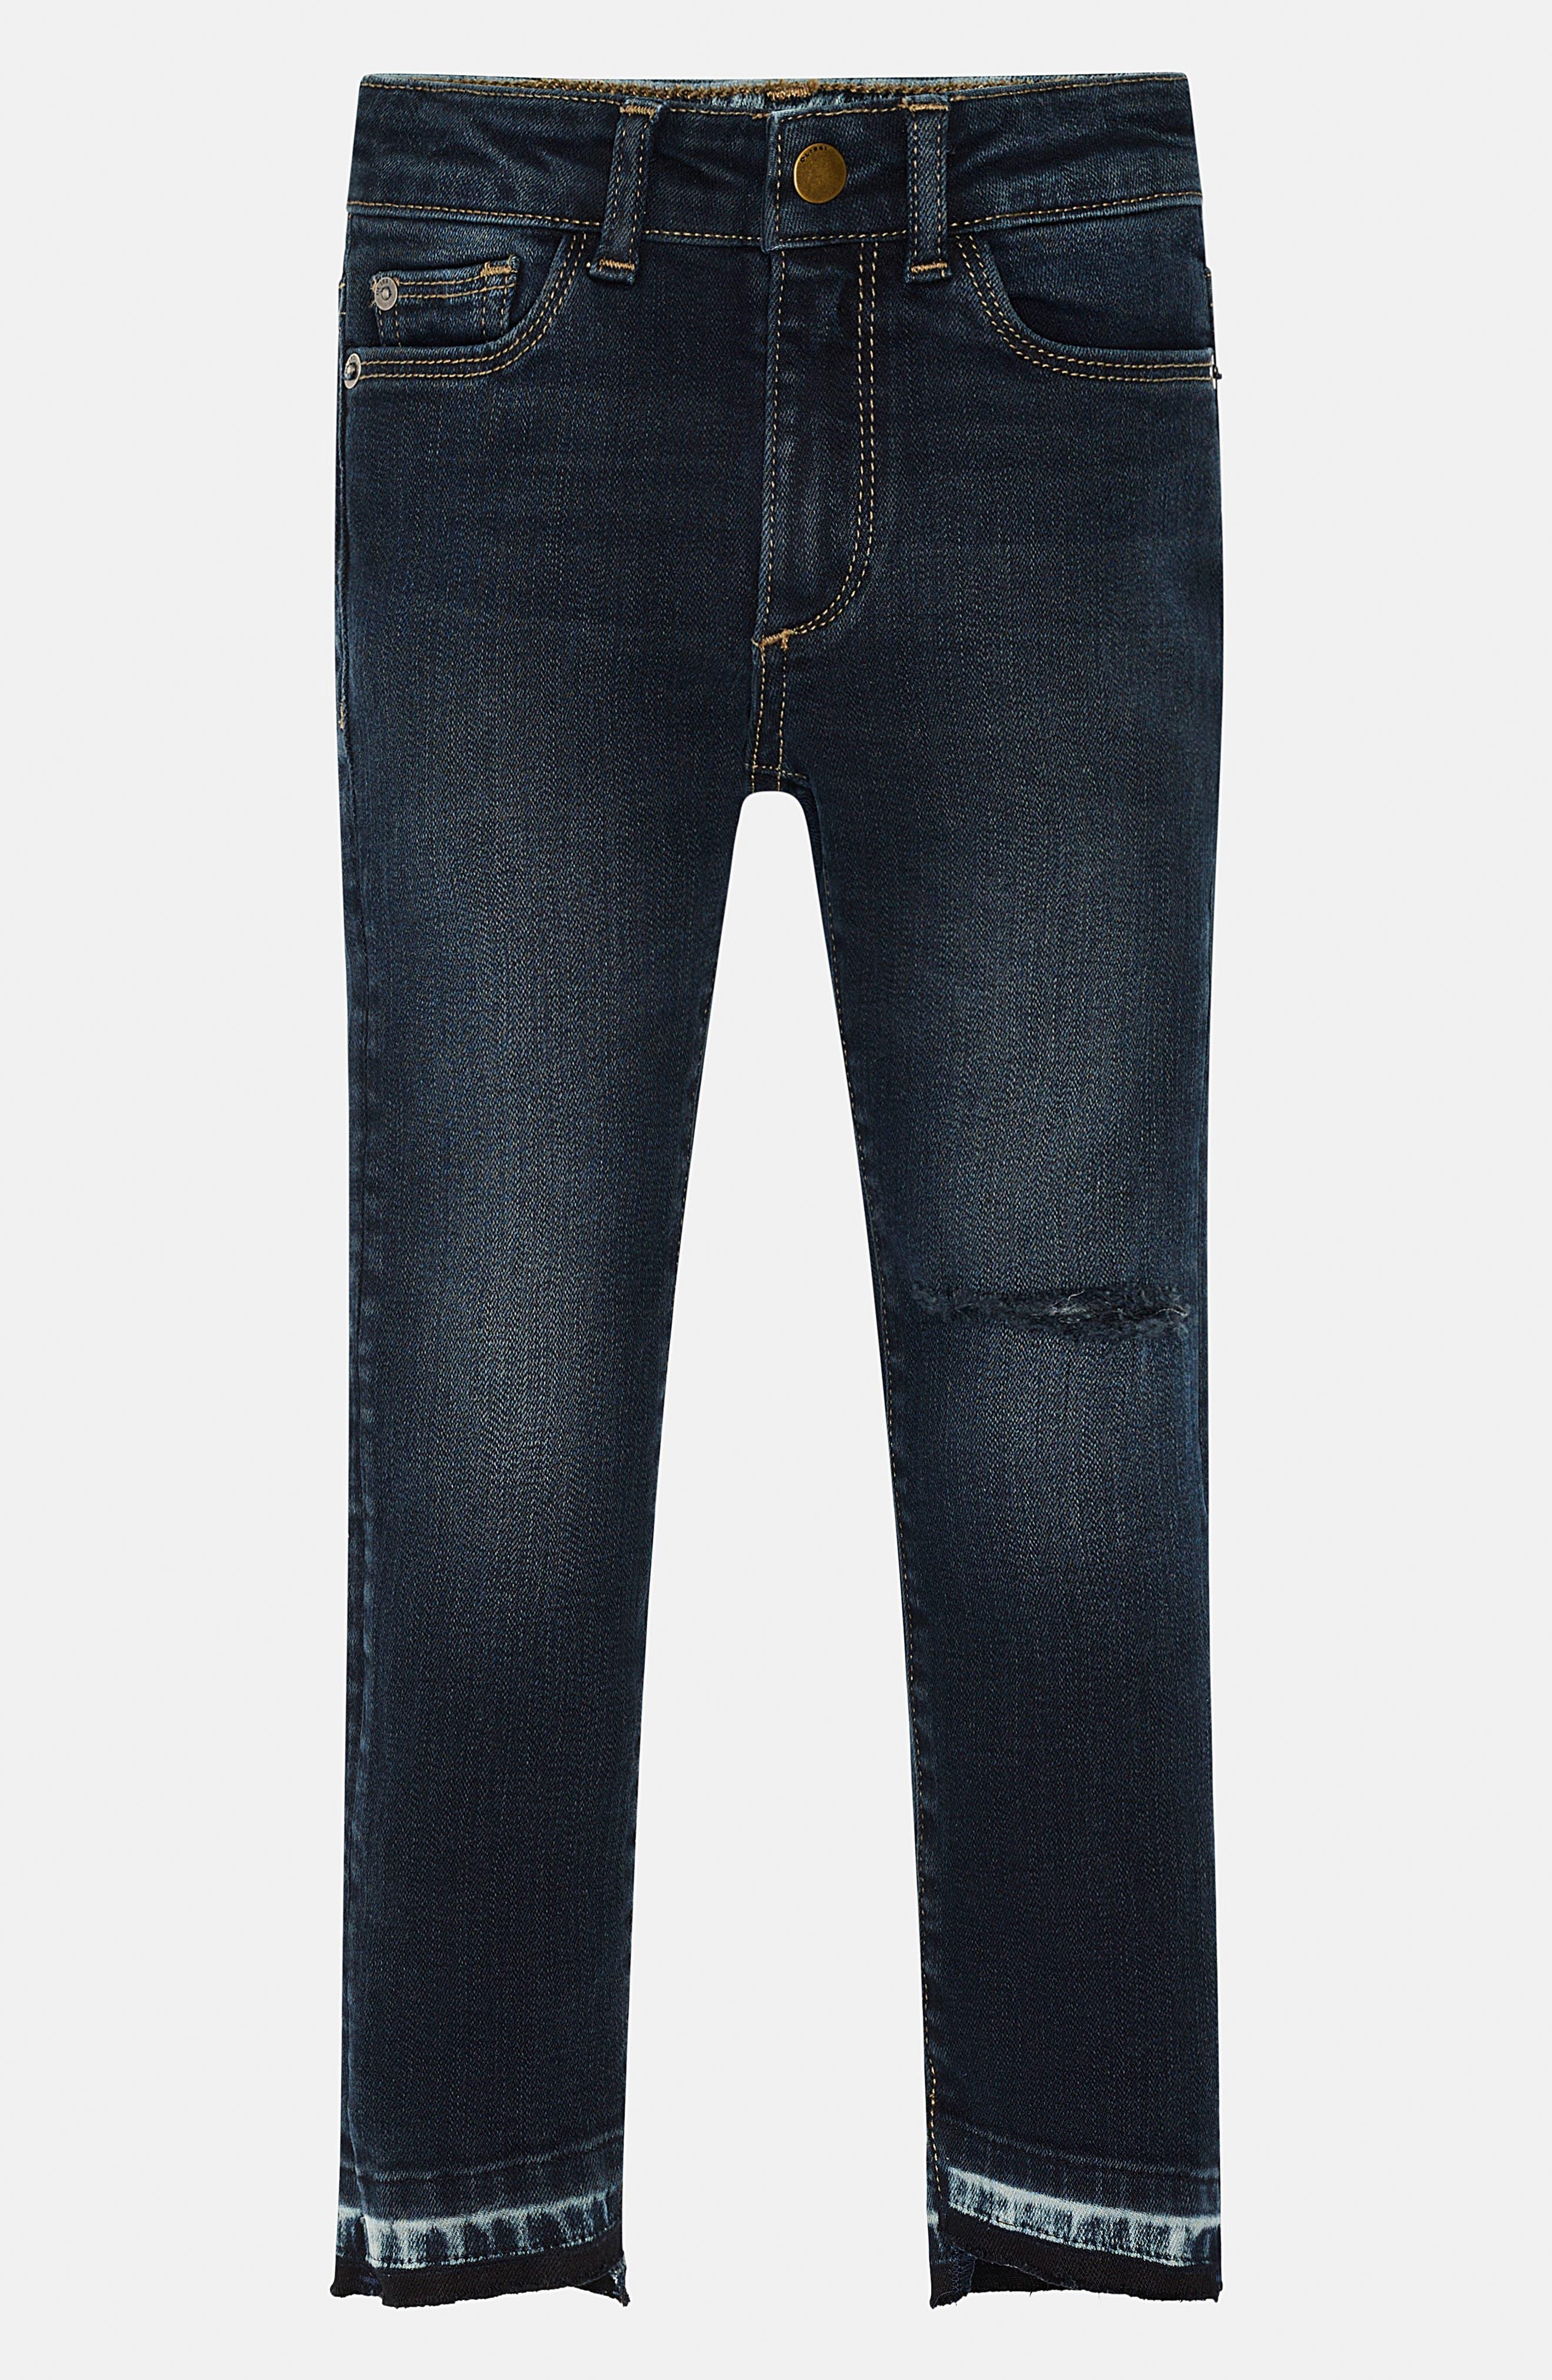 DL1961 Chloe Distressed Skinny Jeans (Toddler Girls & Little Girls)